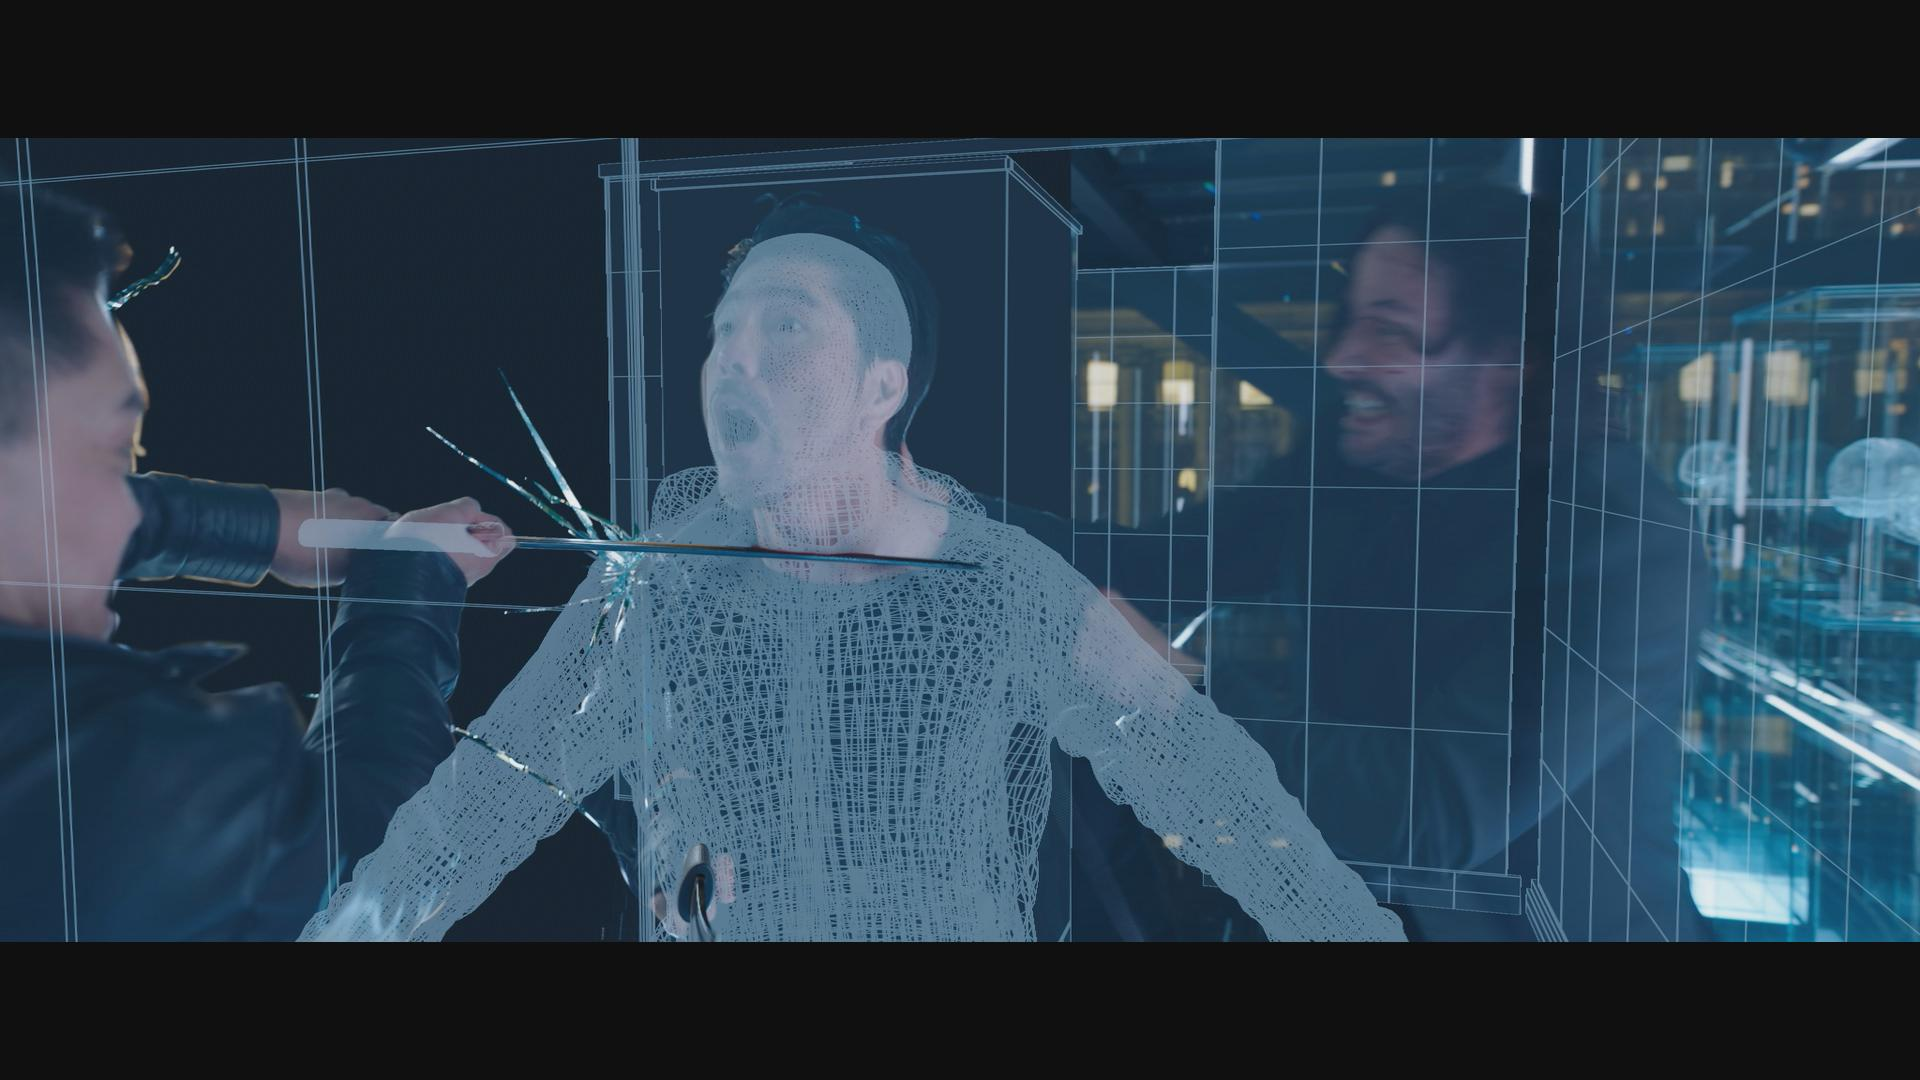 This incredible 'John Wick 3' VFX breakdown shows the insane CGI glass breaking work